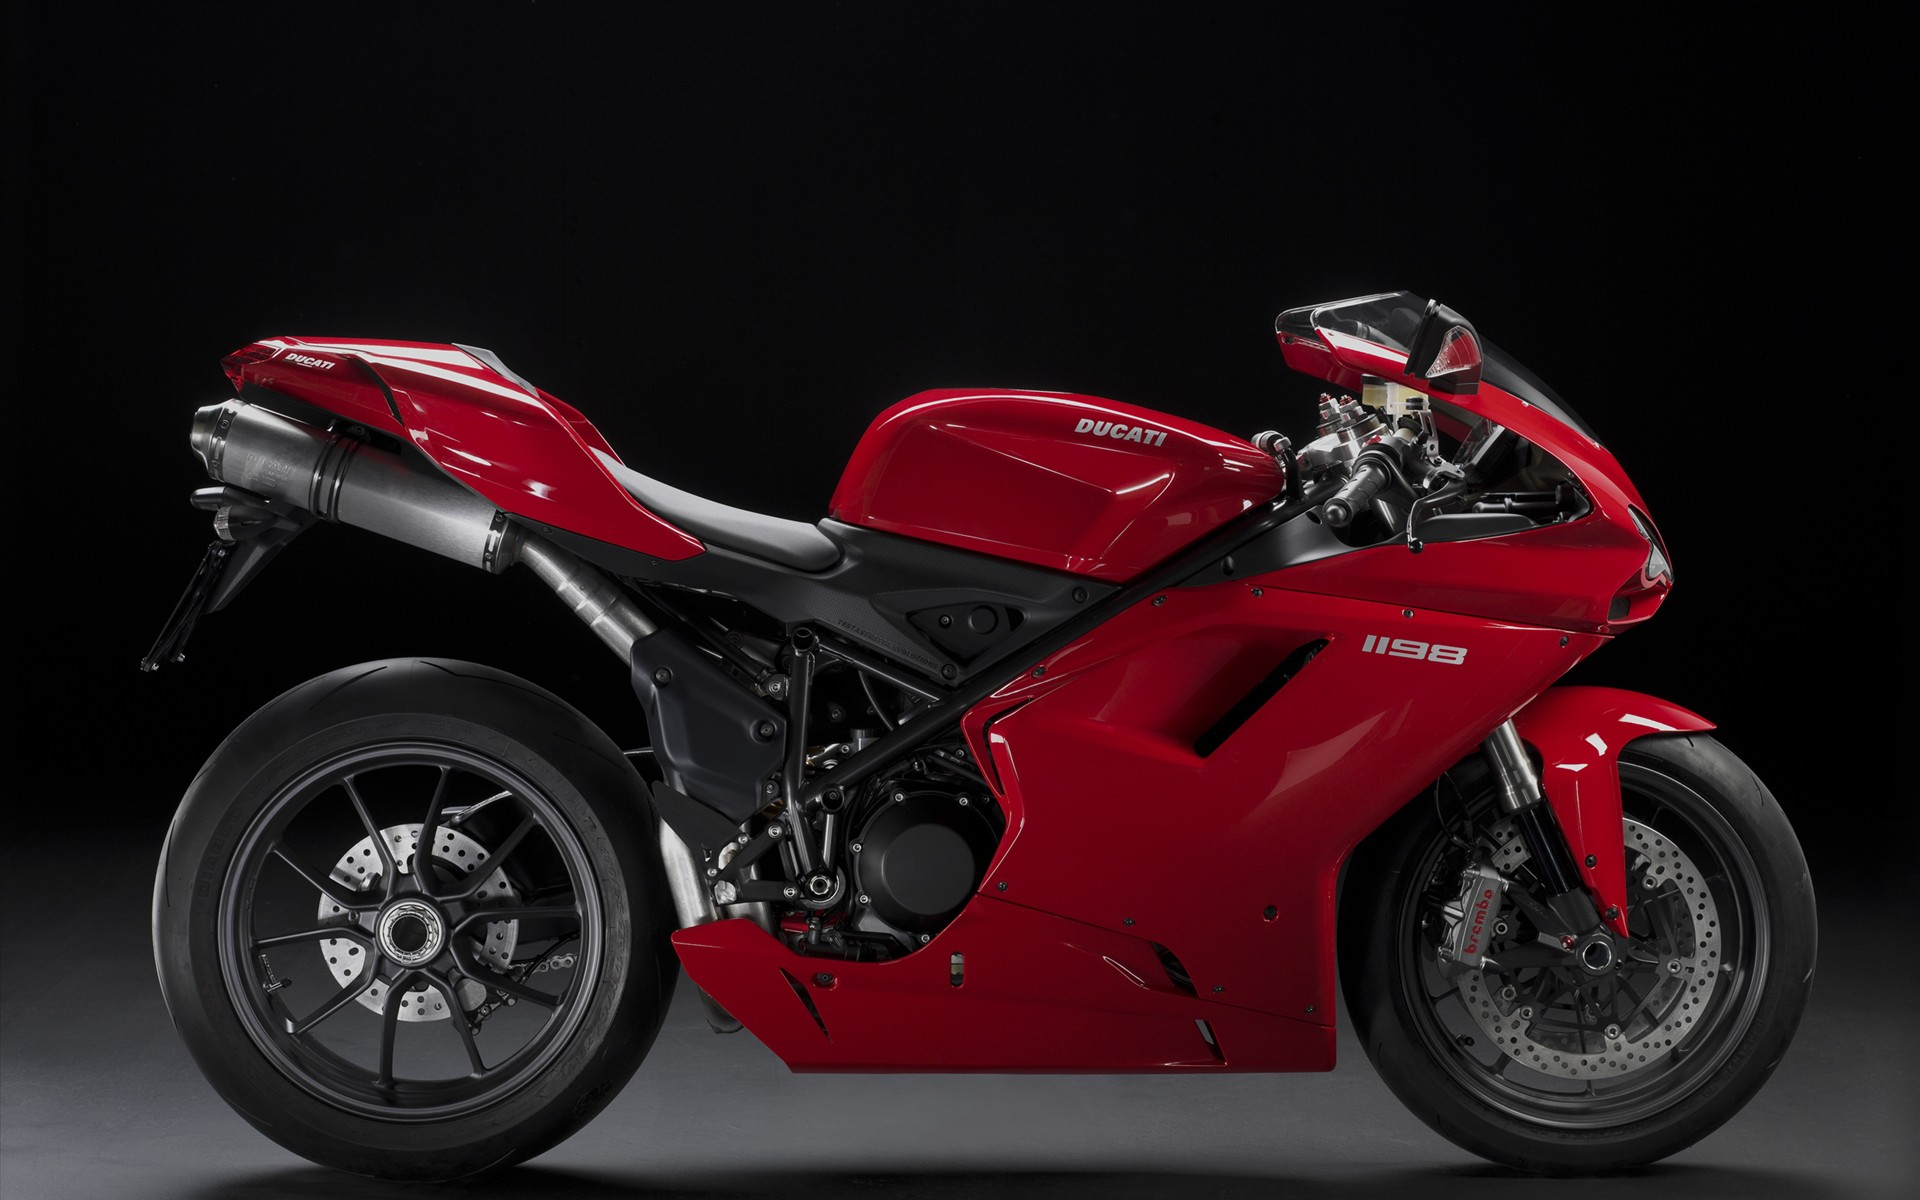 Ducati 1198 Super Bike Wallpapers HD Wallpapers 1920x1200